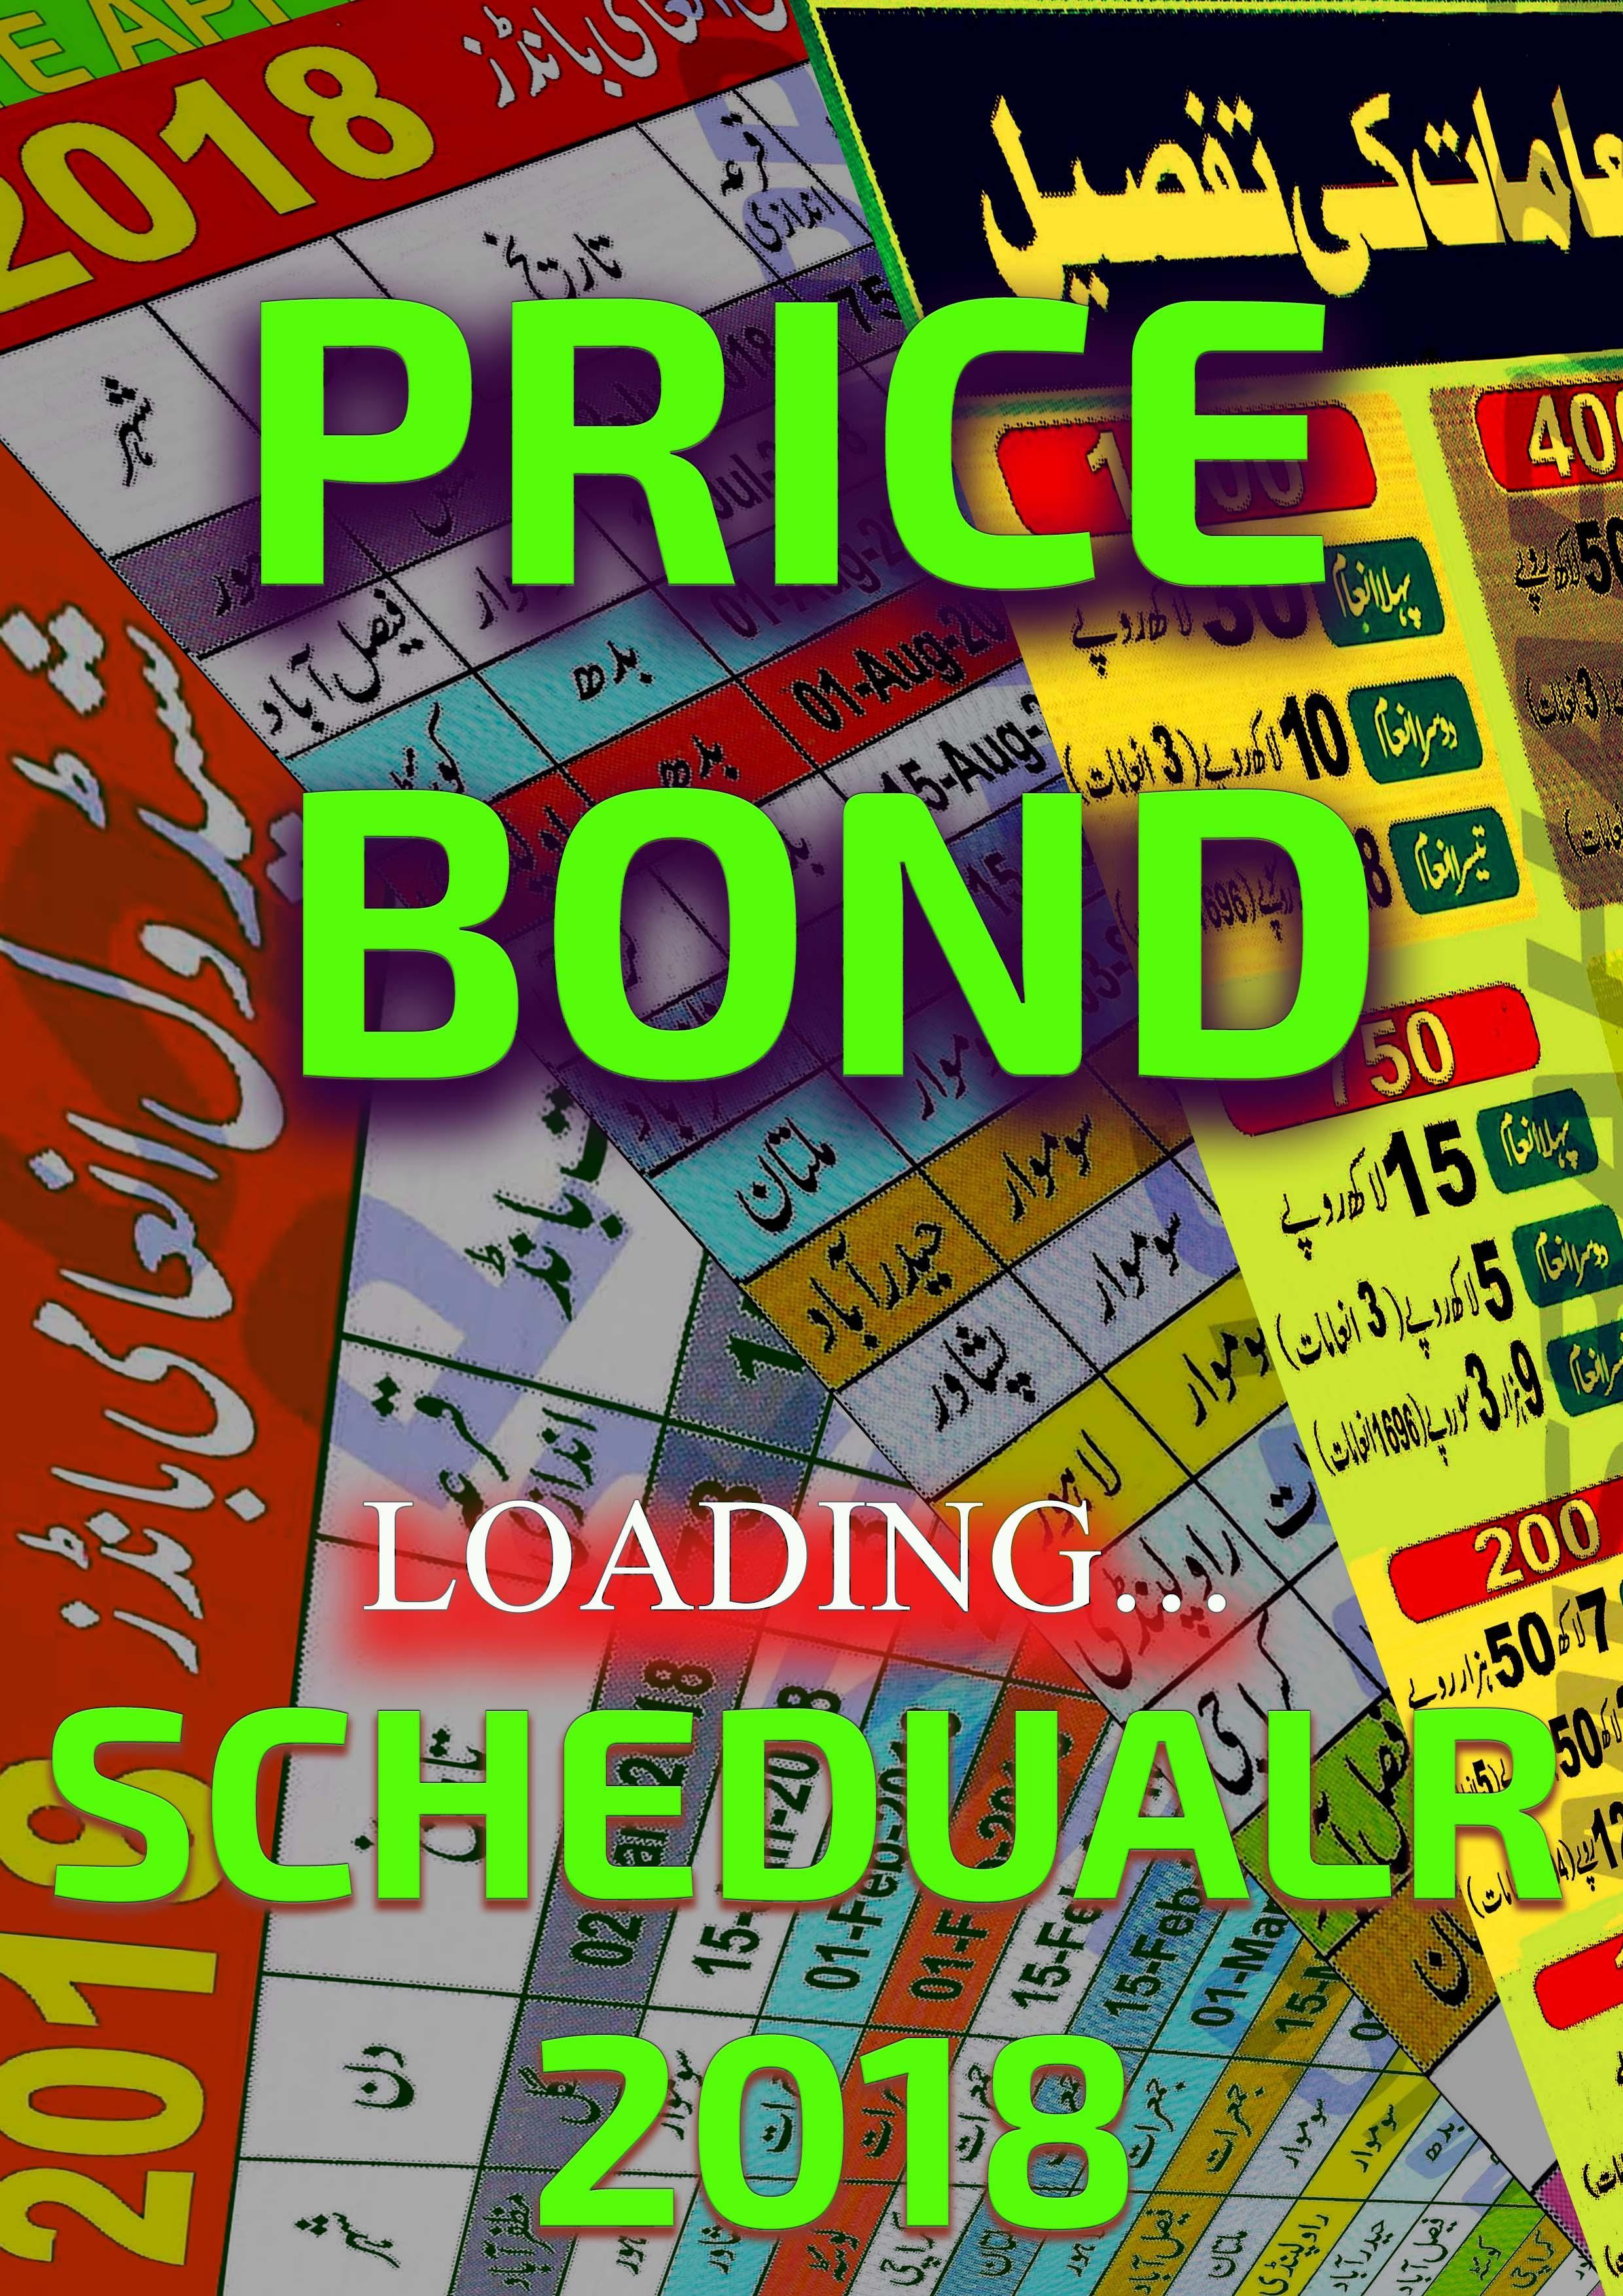 Pricebond Sceduale 2018 Full Detail Для Андроид  Скачать Apk within Khalsa Heera Jantri 2020 Pdf Download